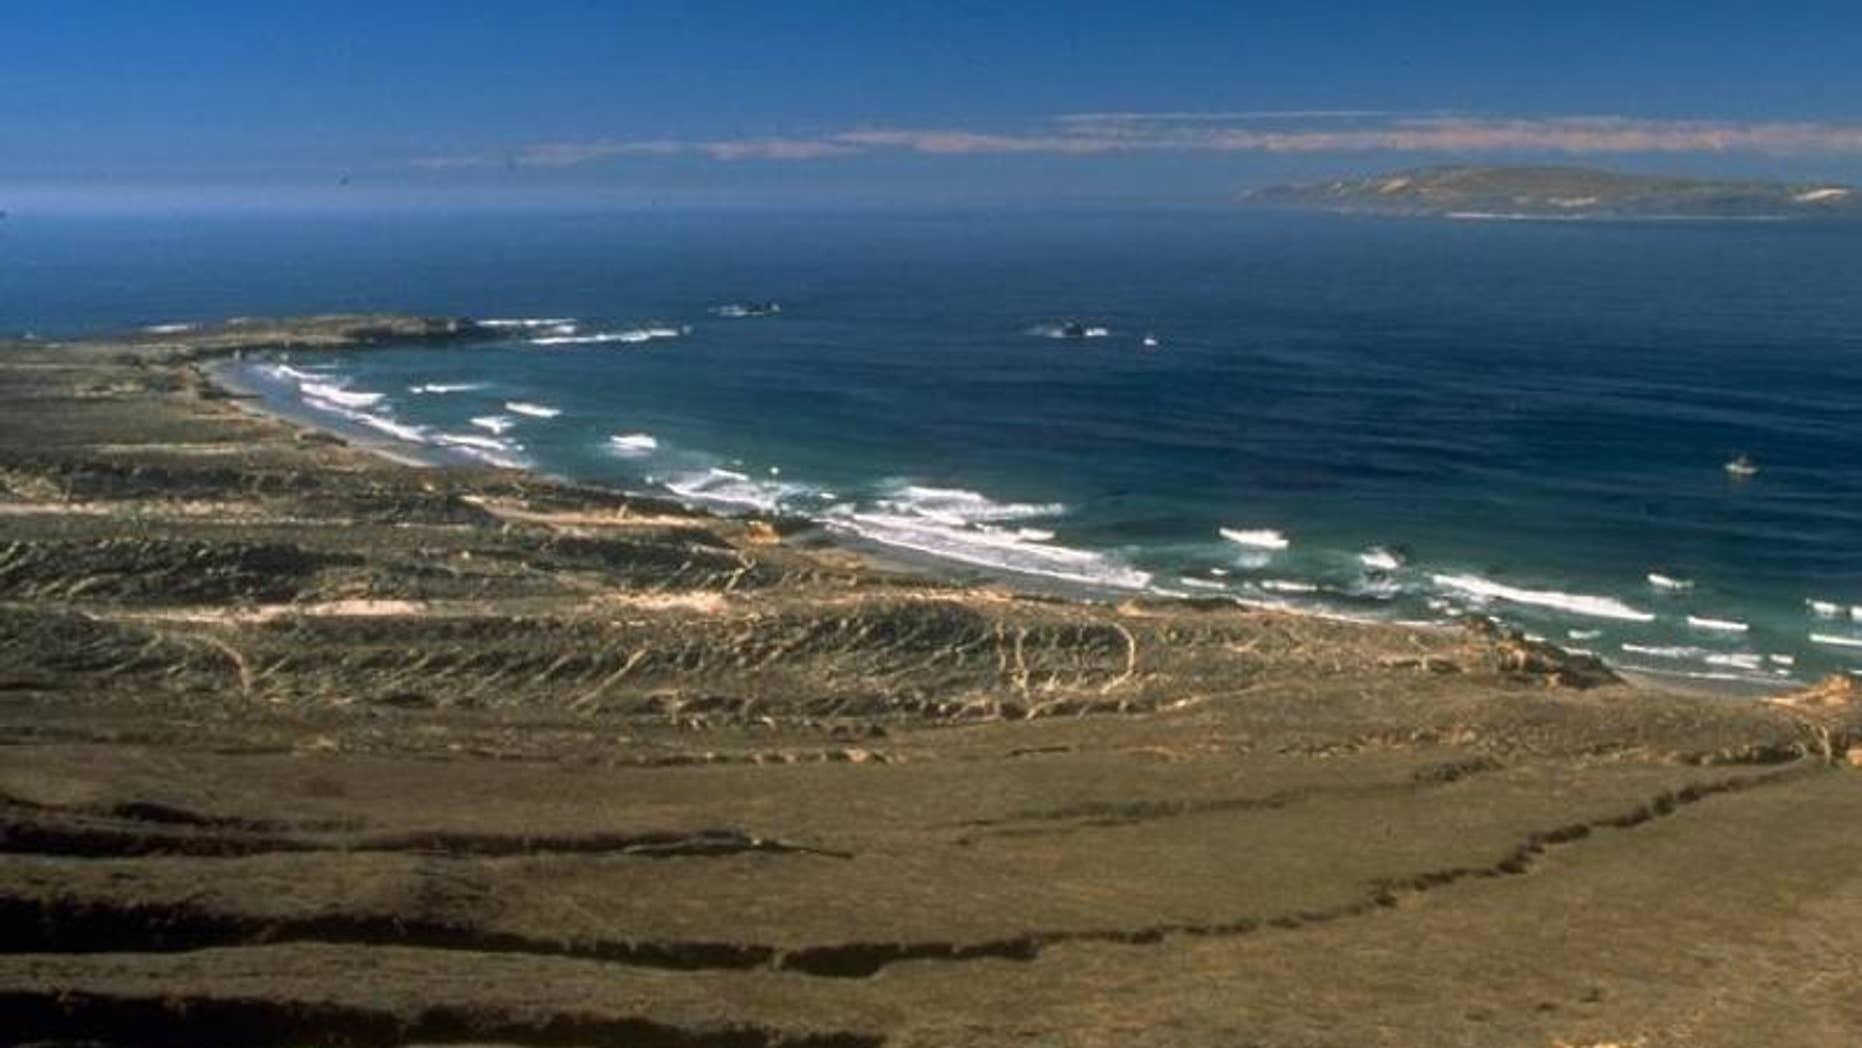 Sandy Point is located on the far west end of Santa Rosa Island near Santa Barbara, Calif.